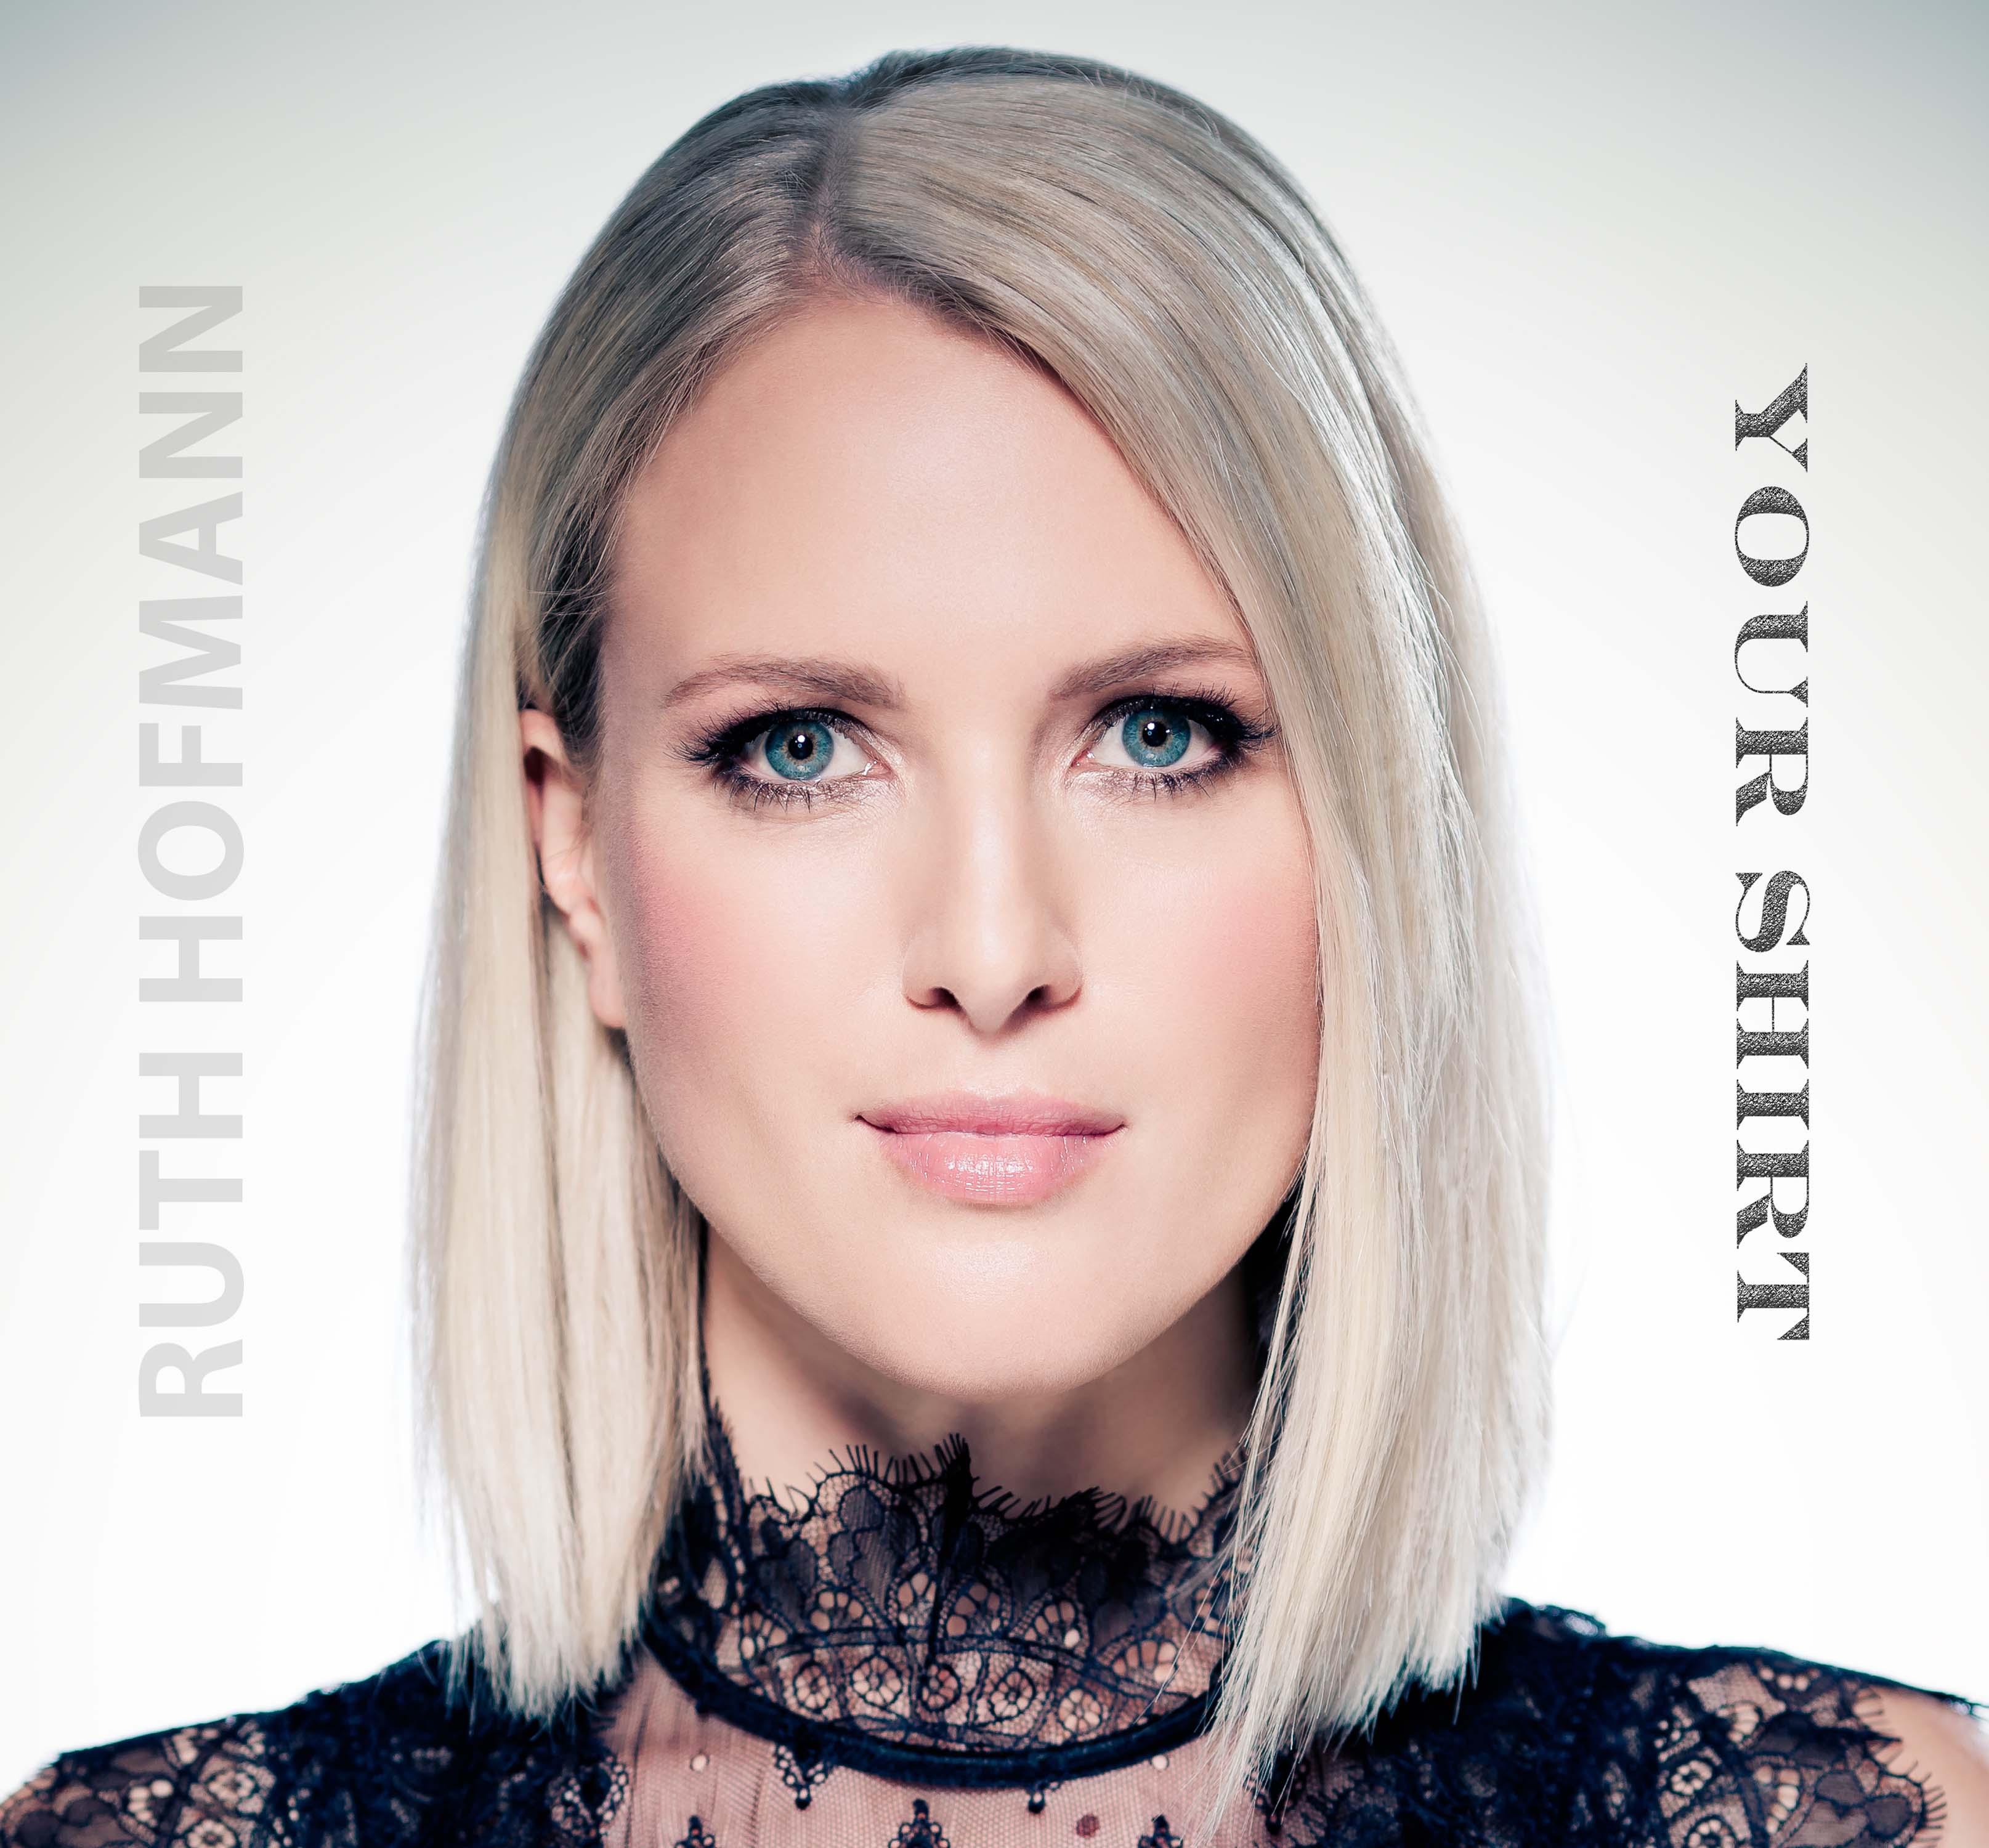 Ruth Hofmann - Your Shirt - Cover